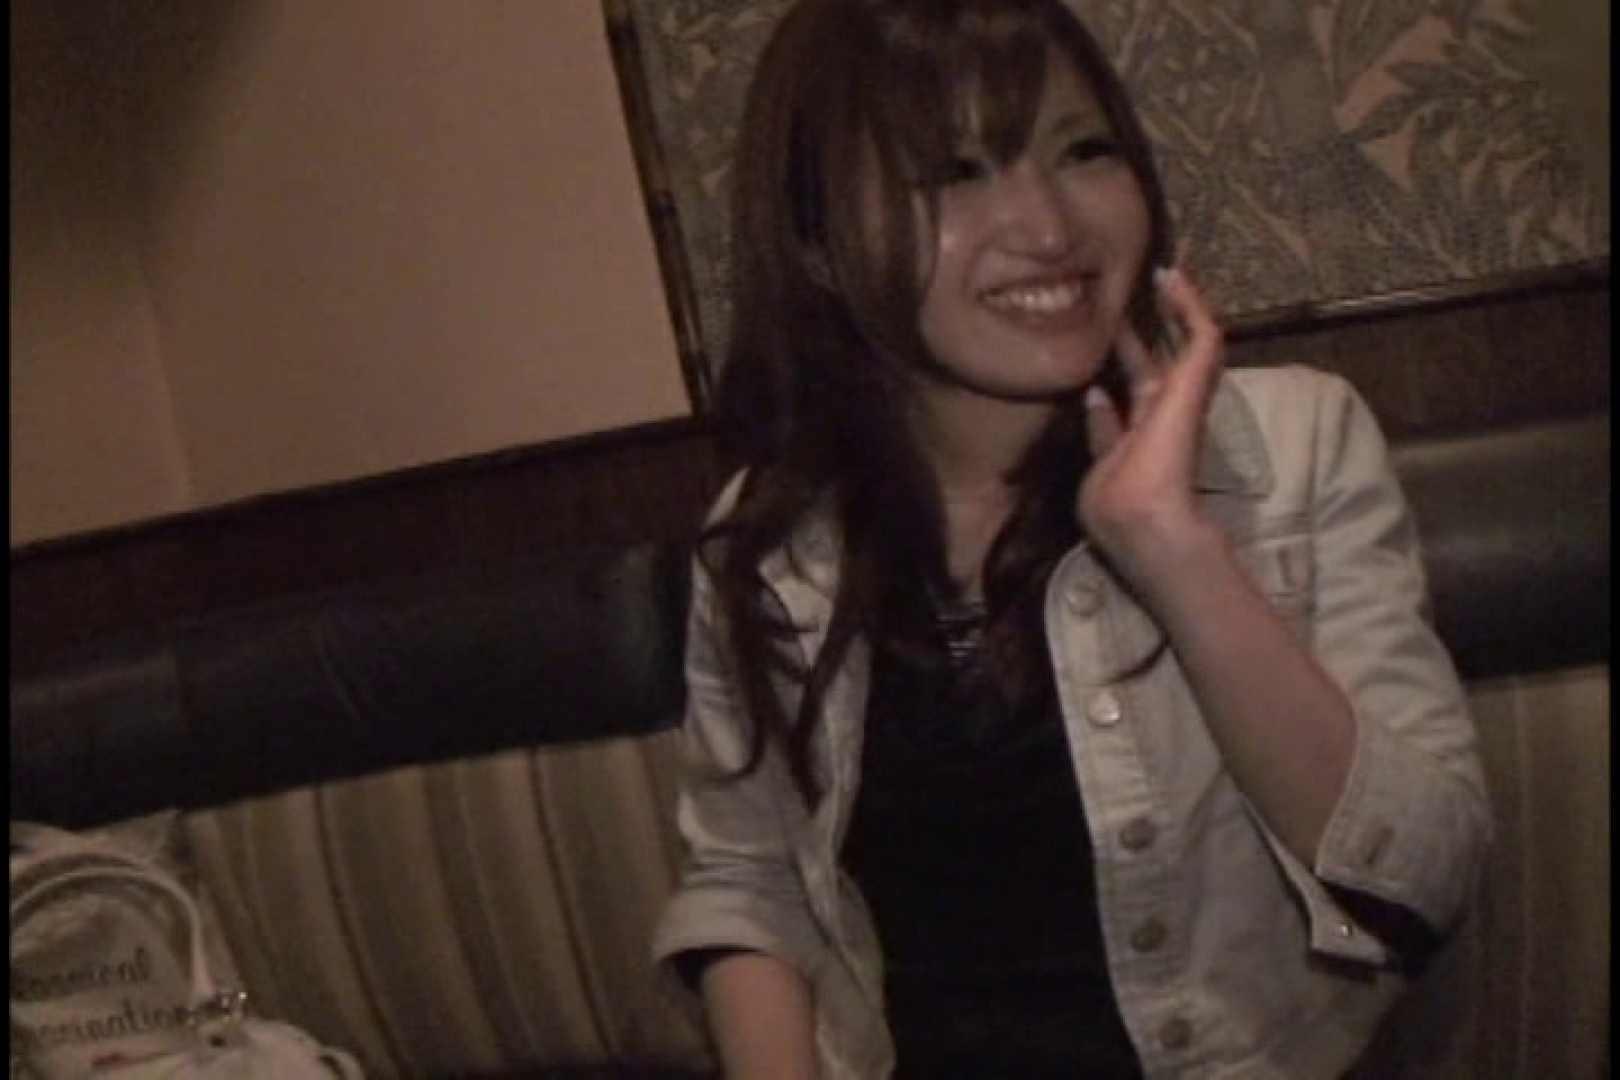 JDハンター全国ツアー vol.042 後編 女子大生のエロ動画   0  104PIX 29